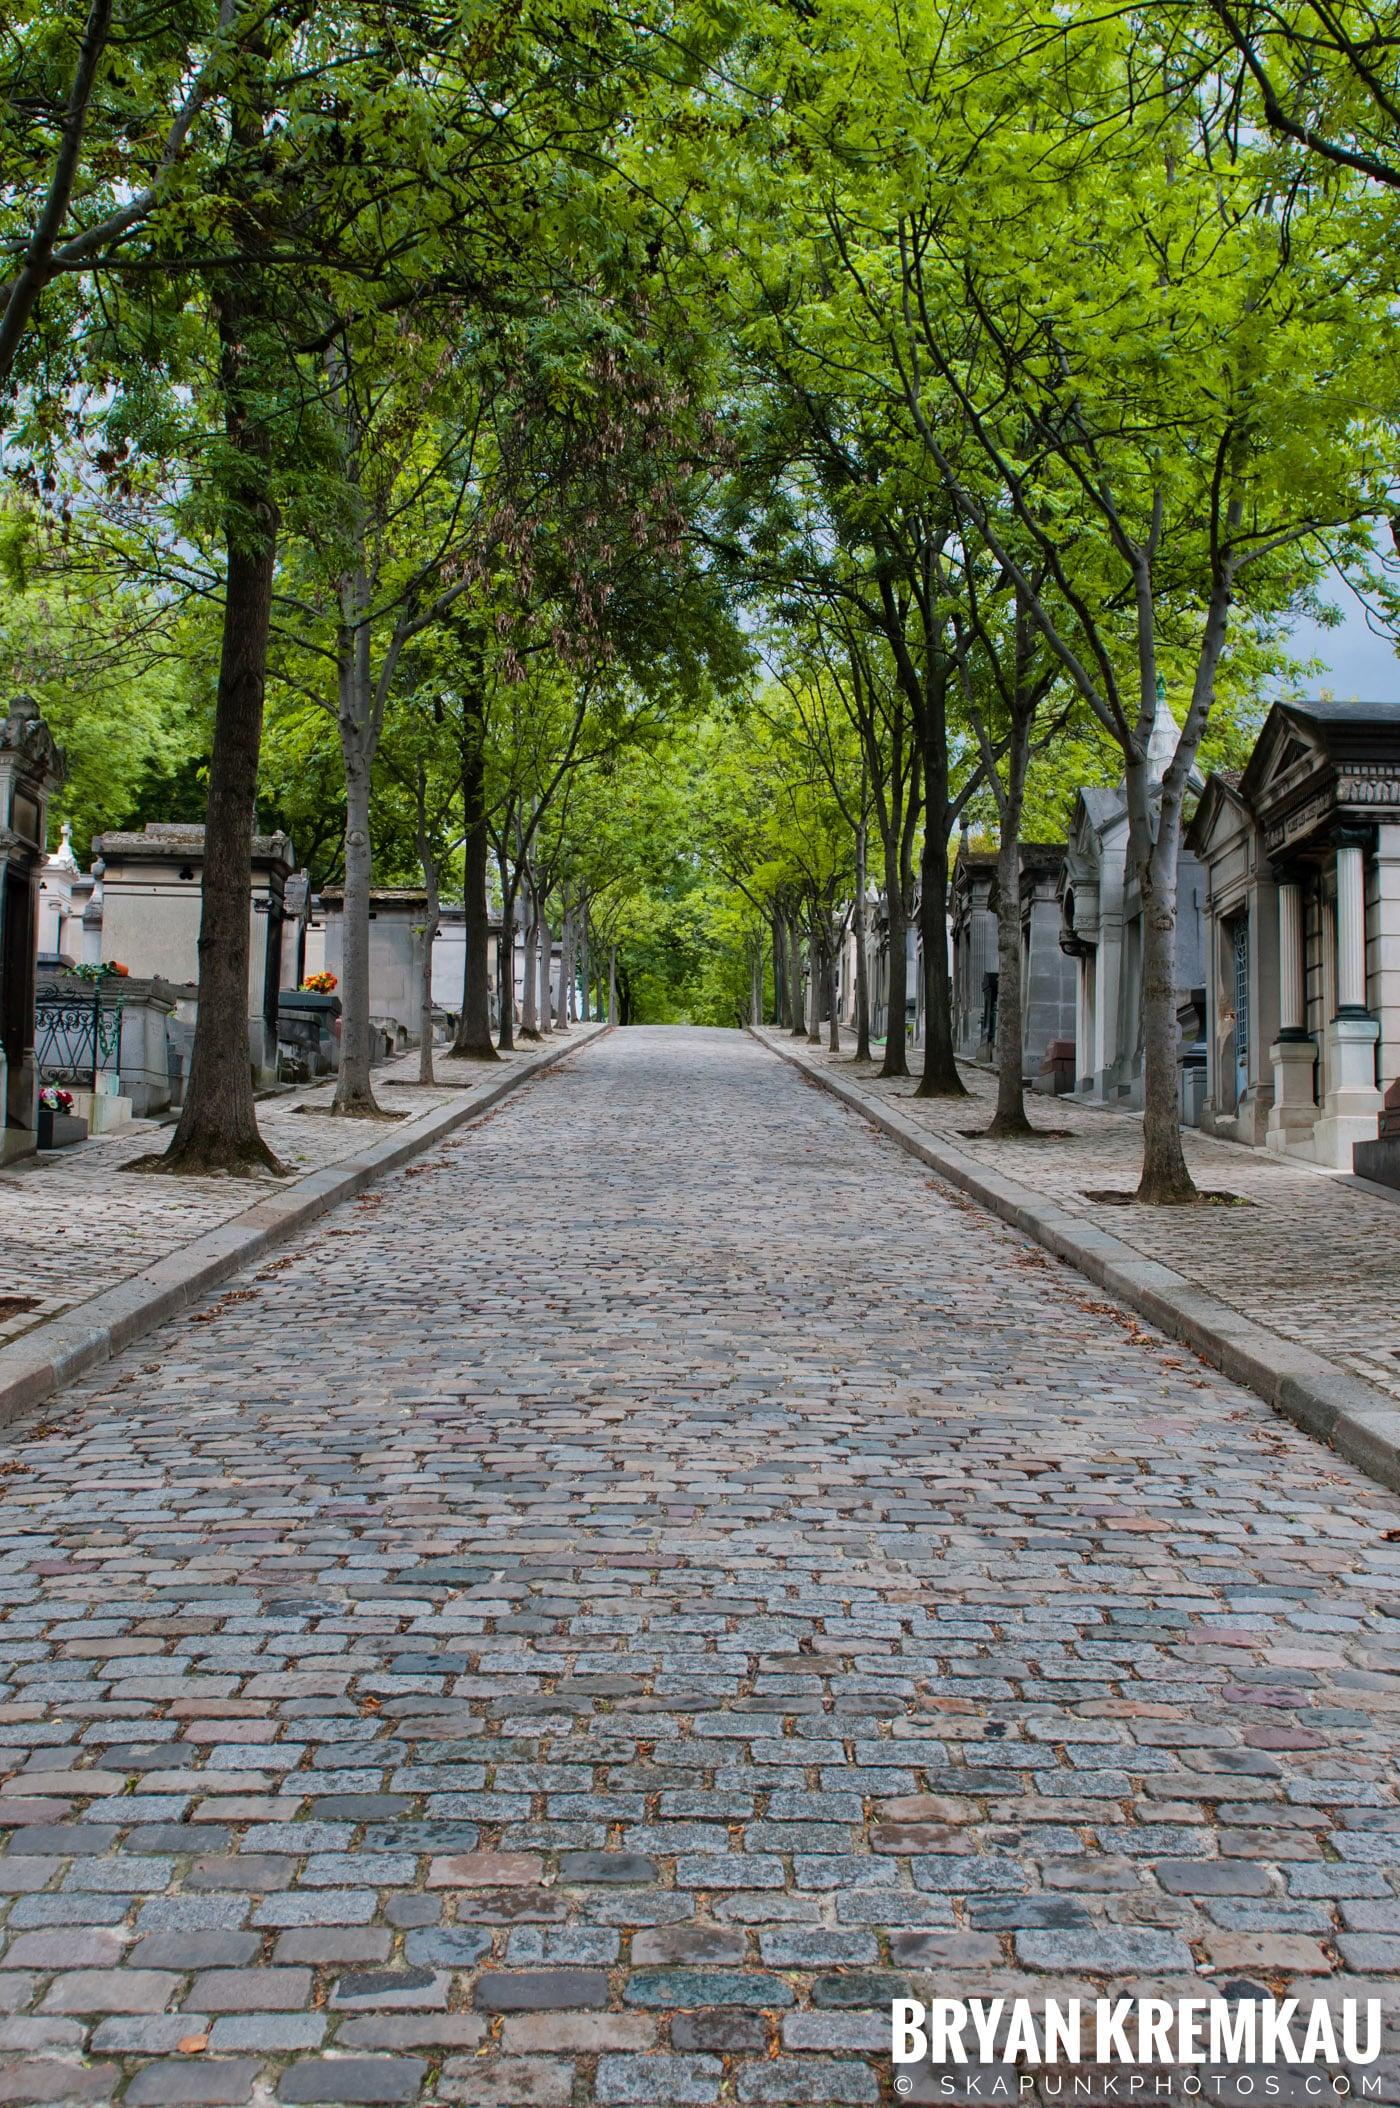 Paris, France Honeymoon - Day 5 - 7.22.11 (29)